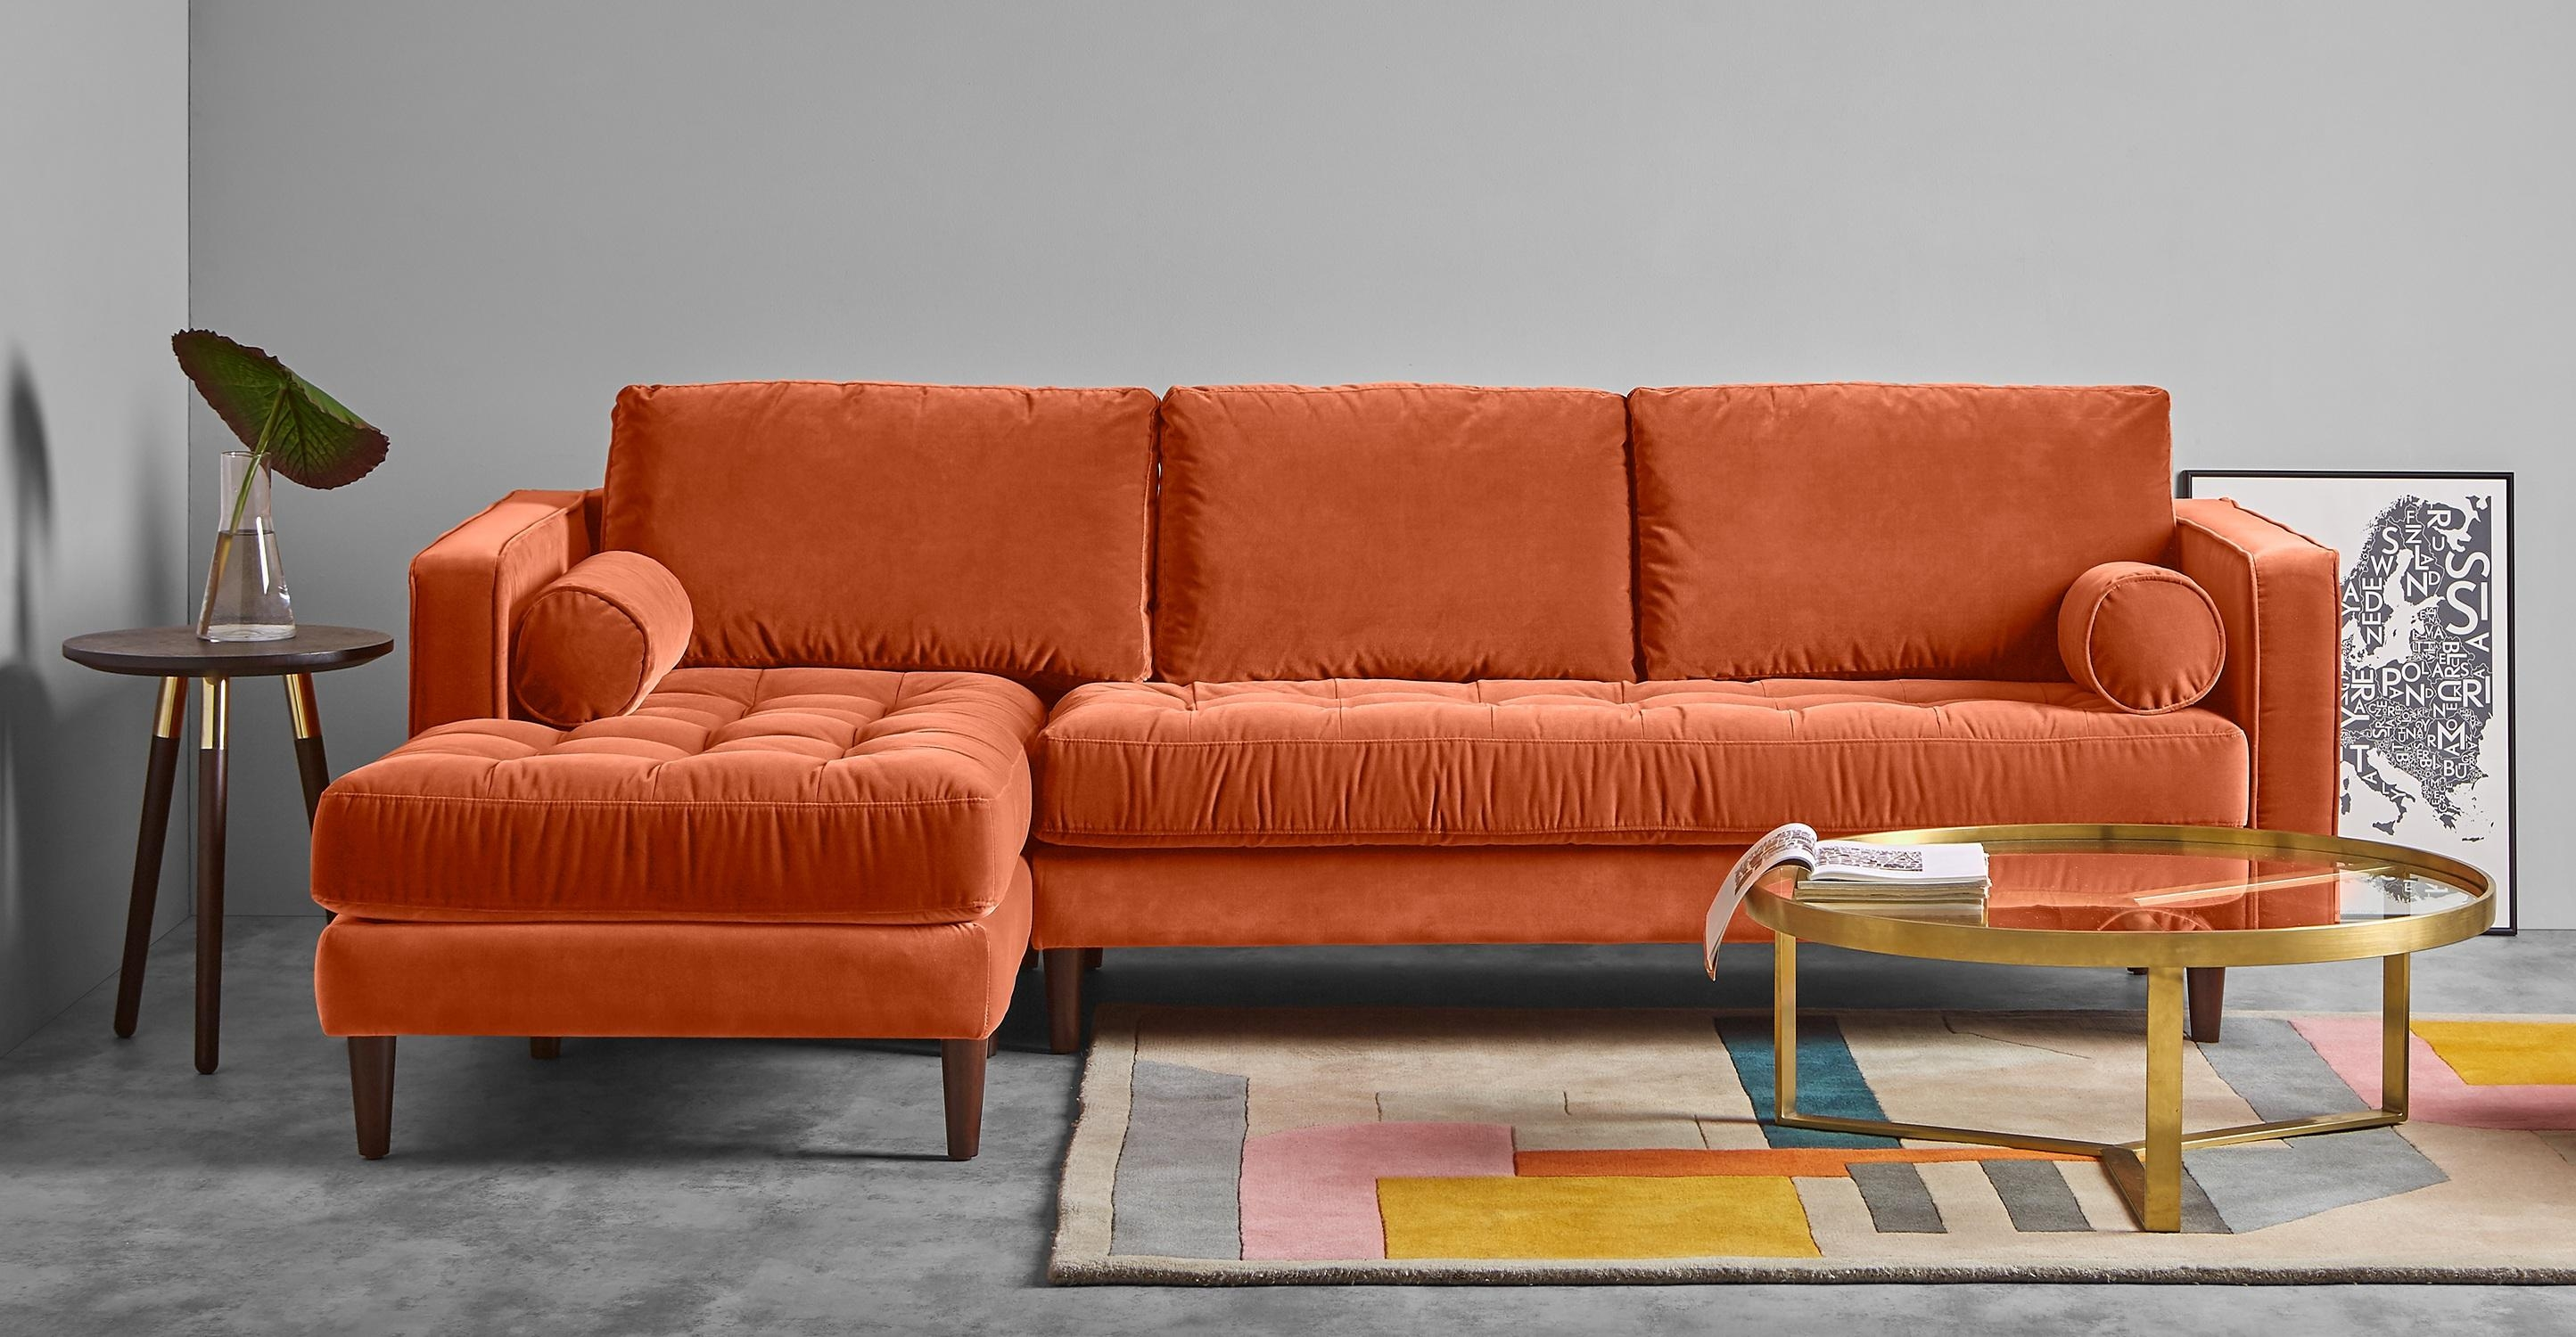 Scott 4 Seater Left Hand Facing Chaise End Sofa, Burnt Orange Within Burnt Orange Sofas (Image 15 of 20)